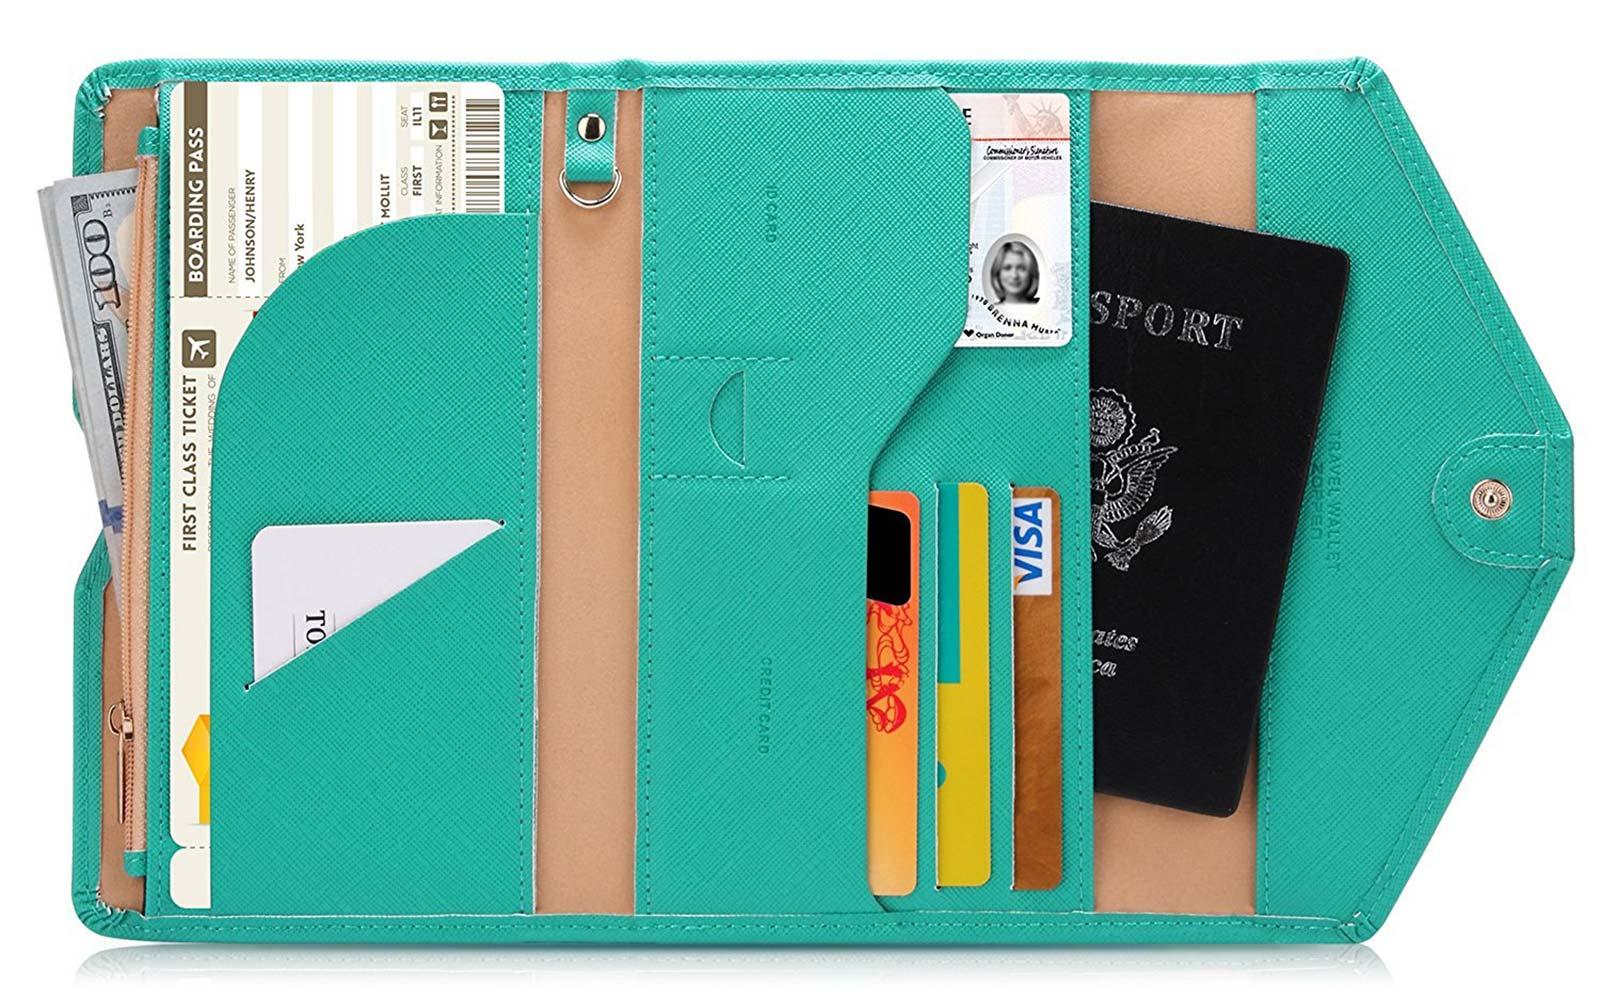 Zoppen Passport Wallet Gift Guide Under $25